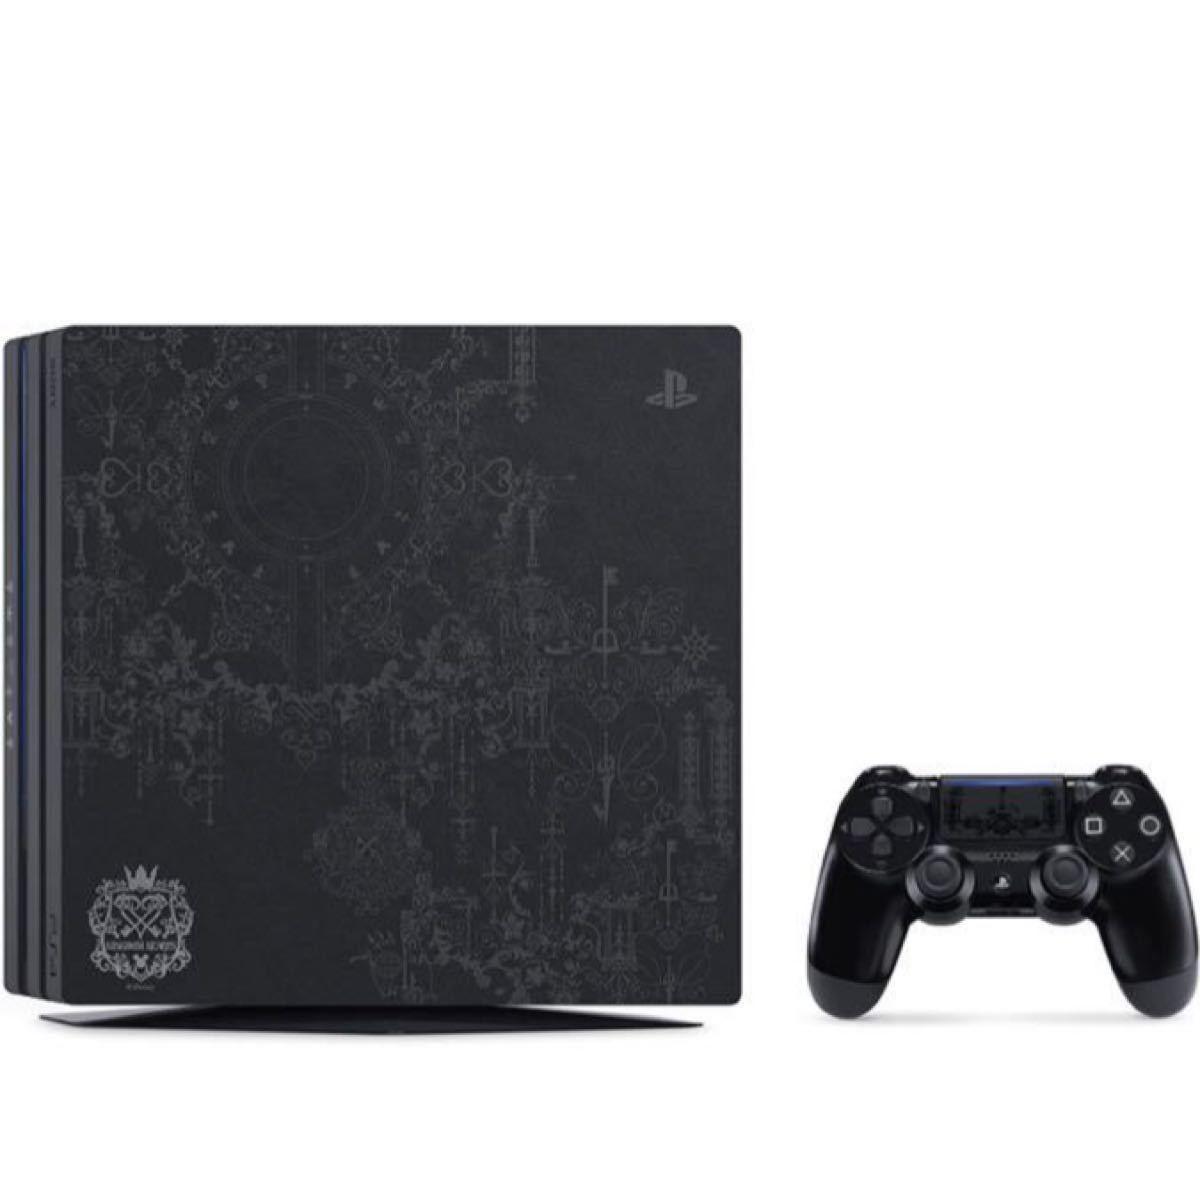 PS4 Pro キングダムハーツIII LIMITED EDITION